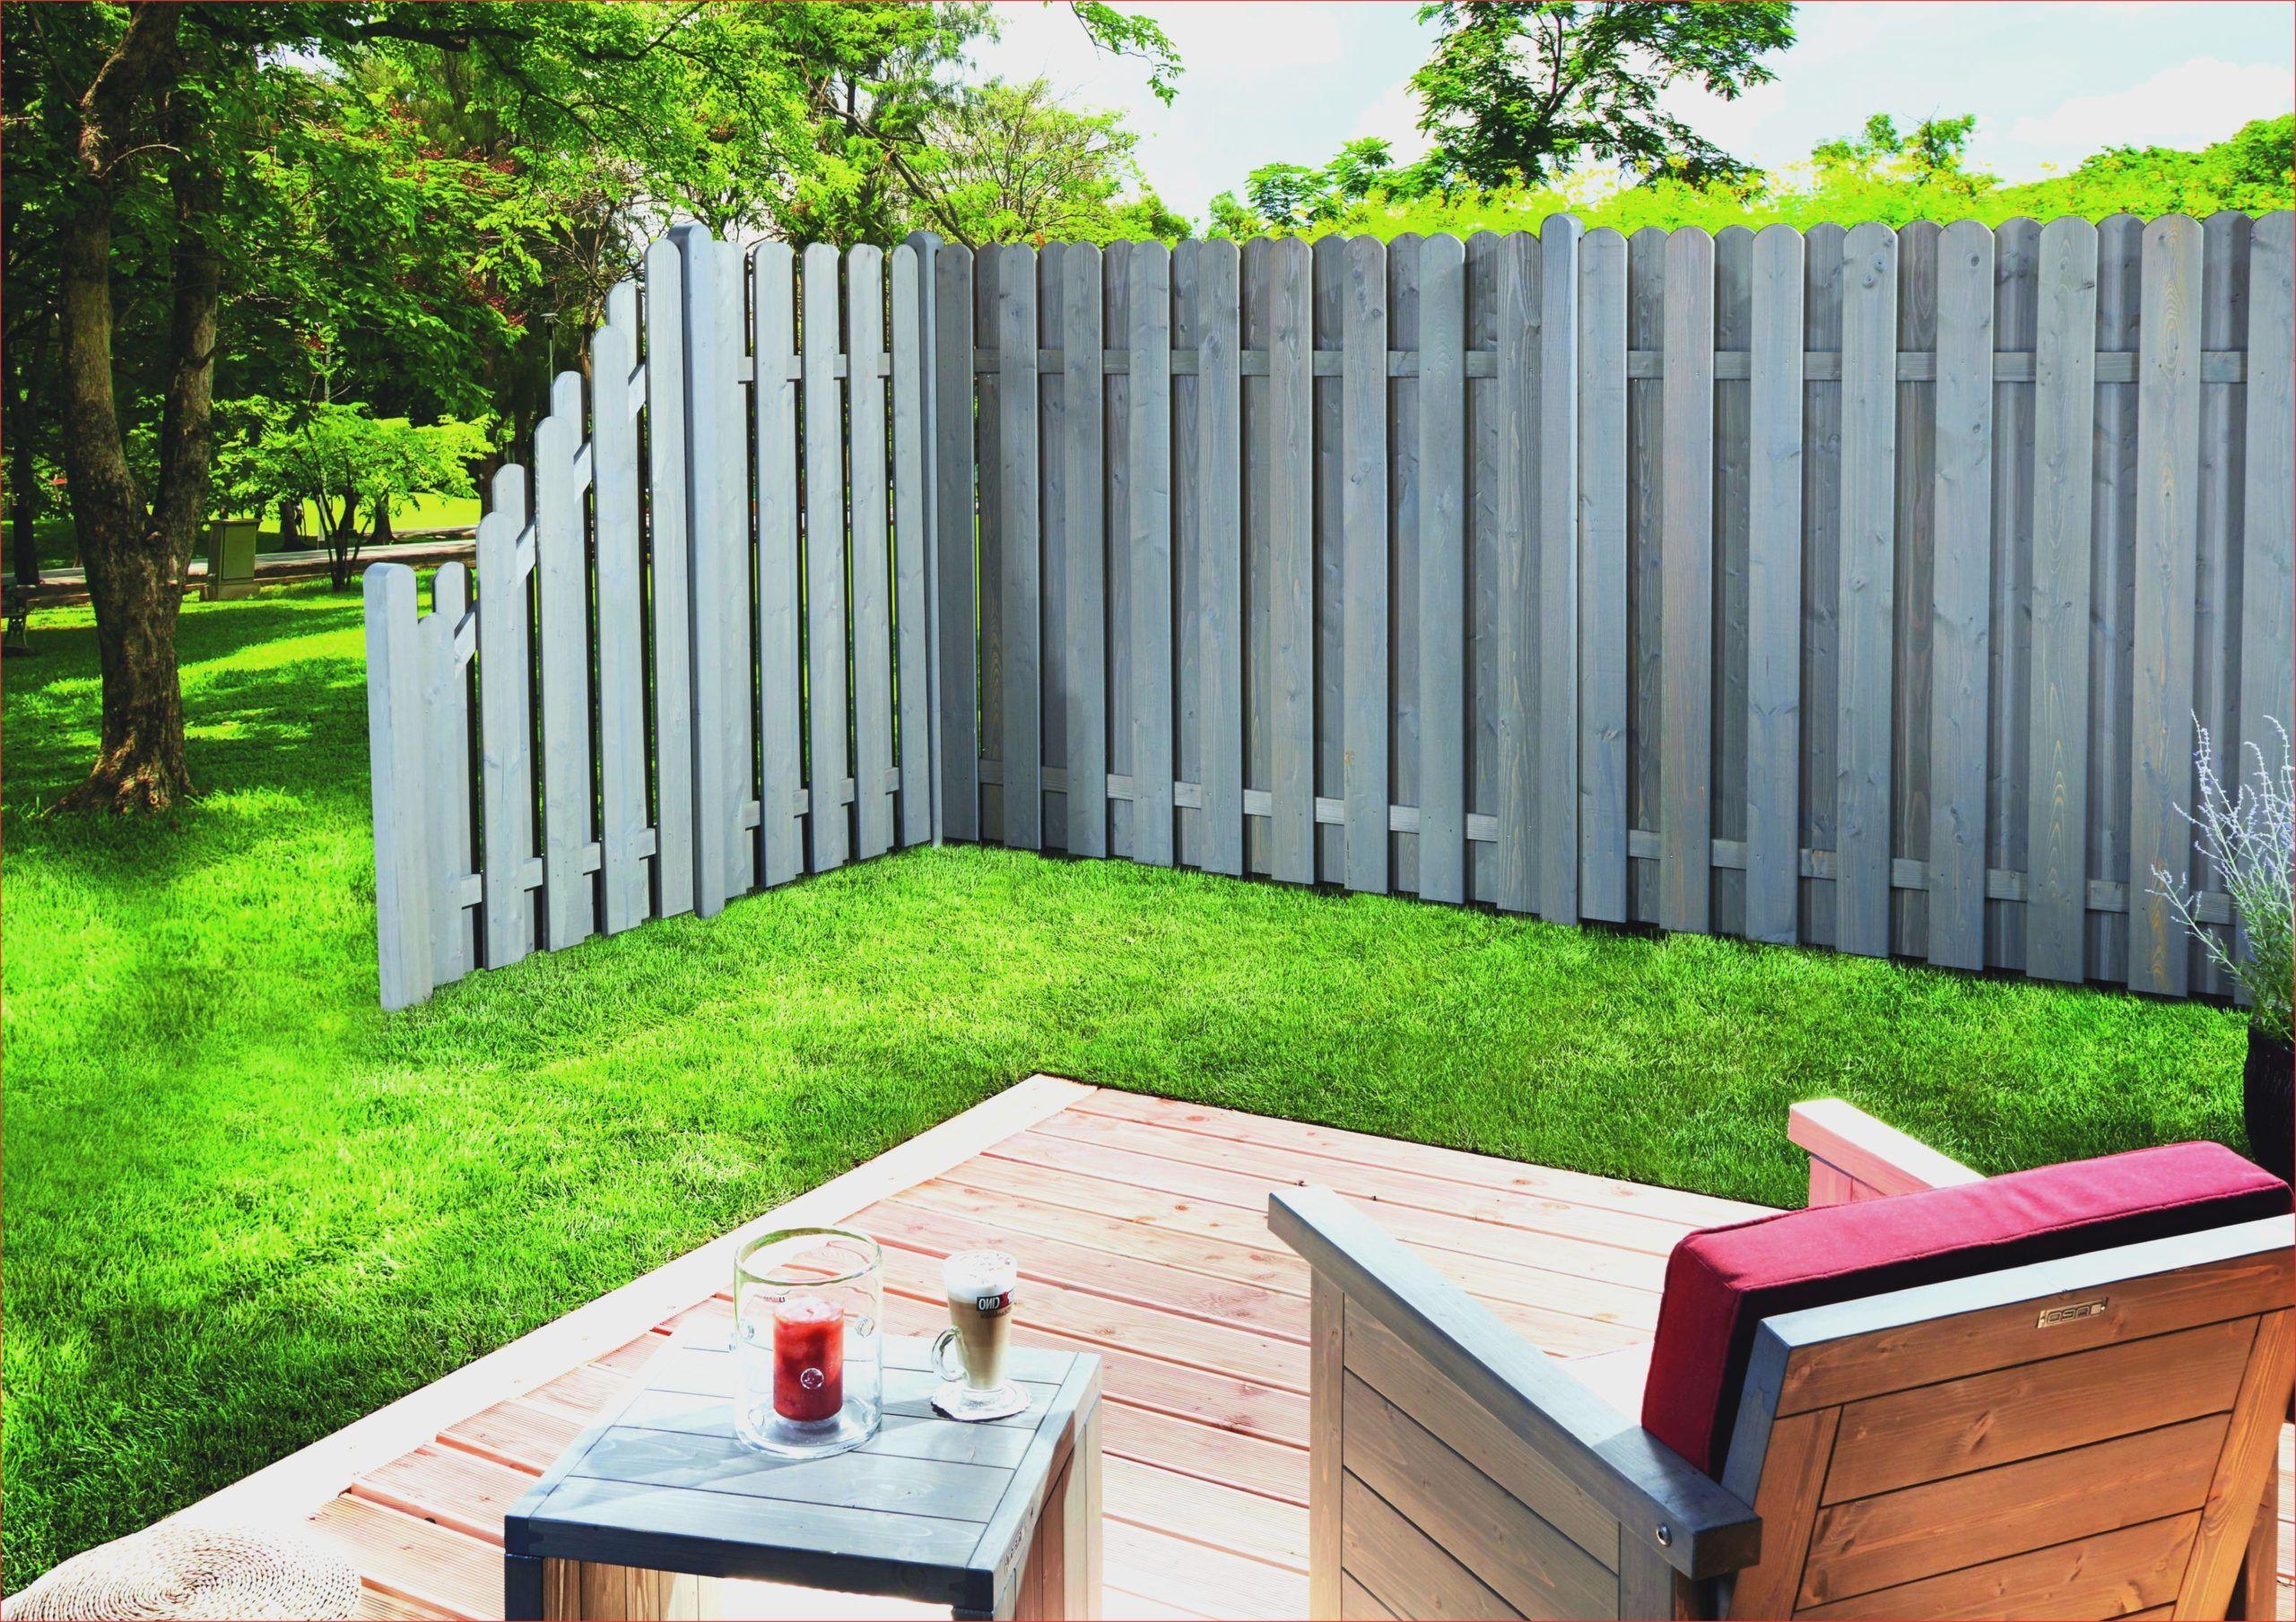 30 Frisch Ikea Sichtschutz Balkon O99p Bambussichtschutz Garten